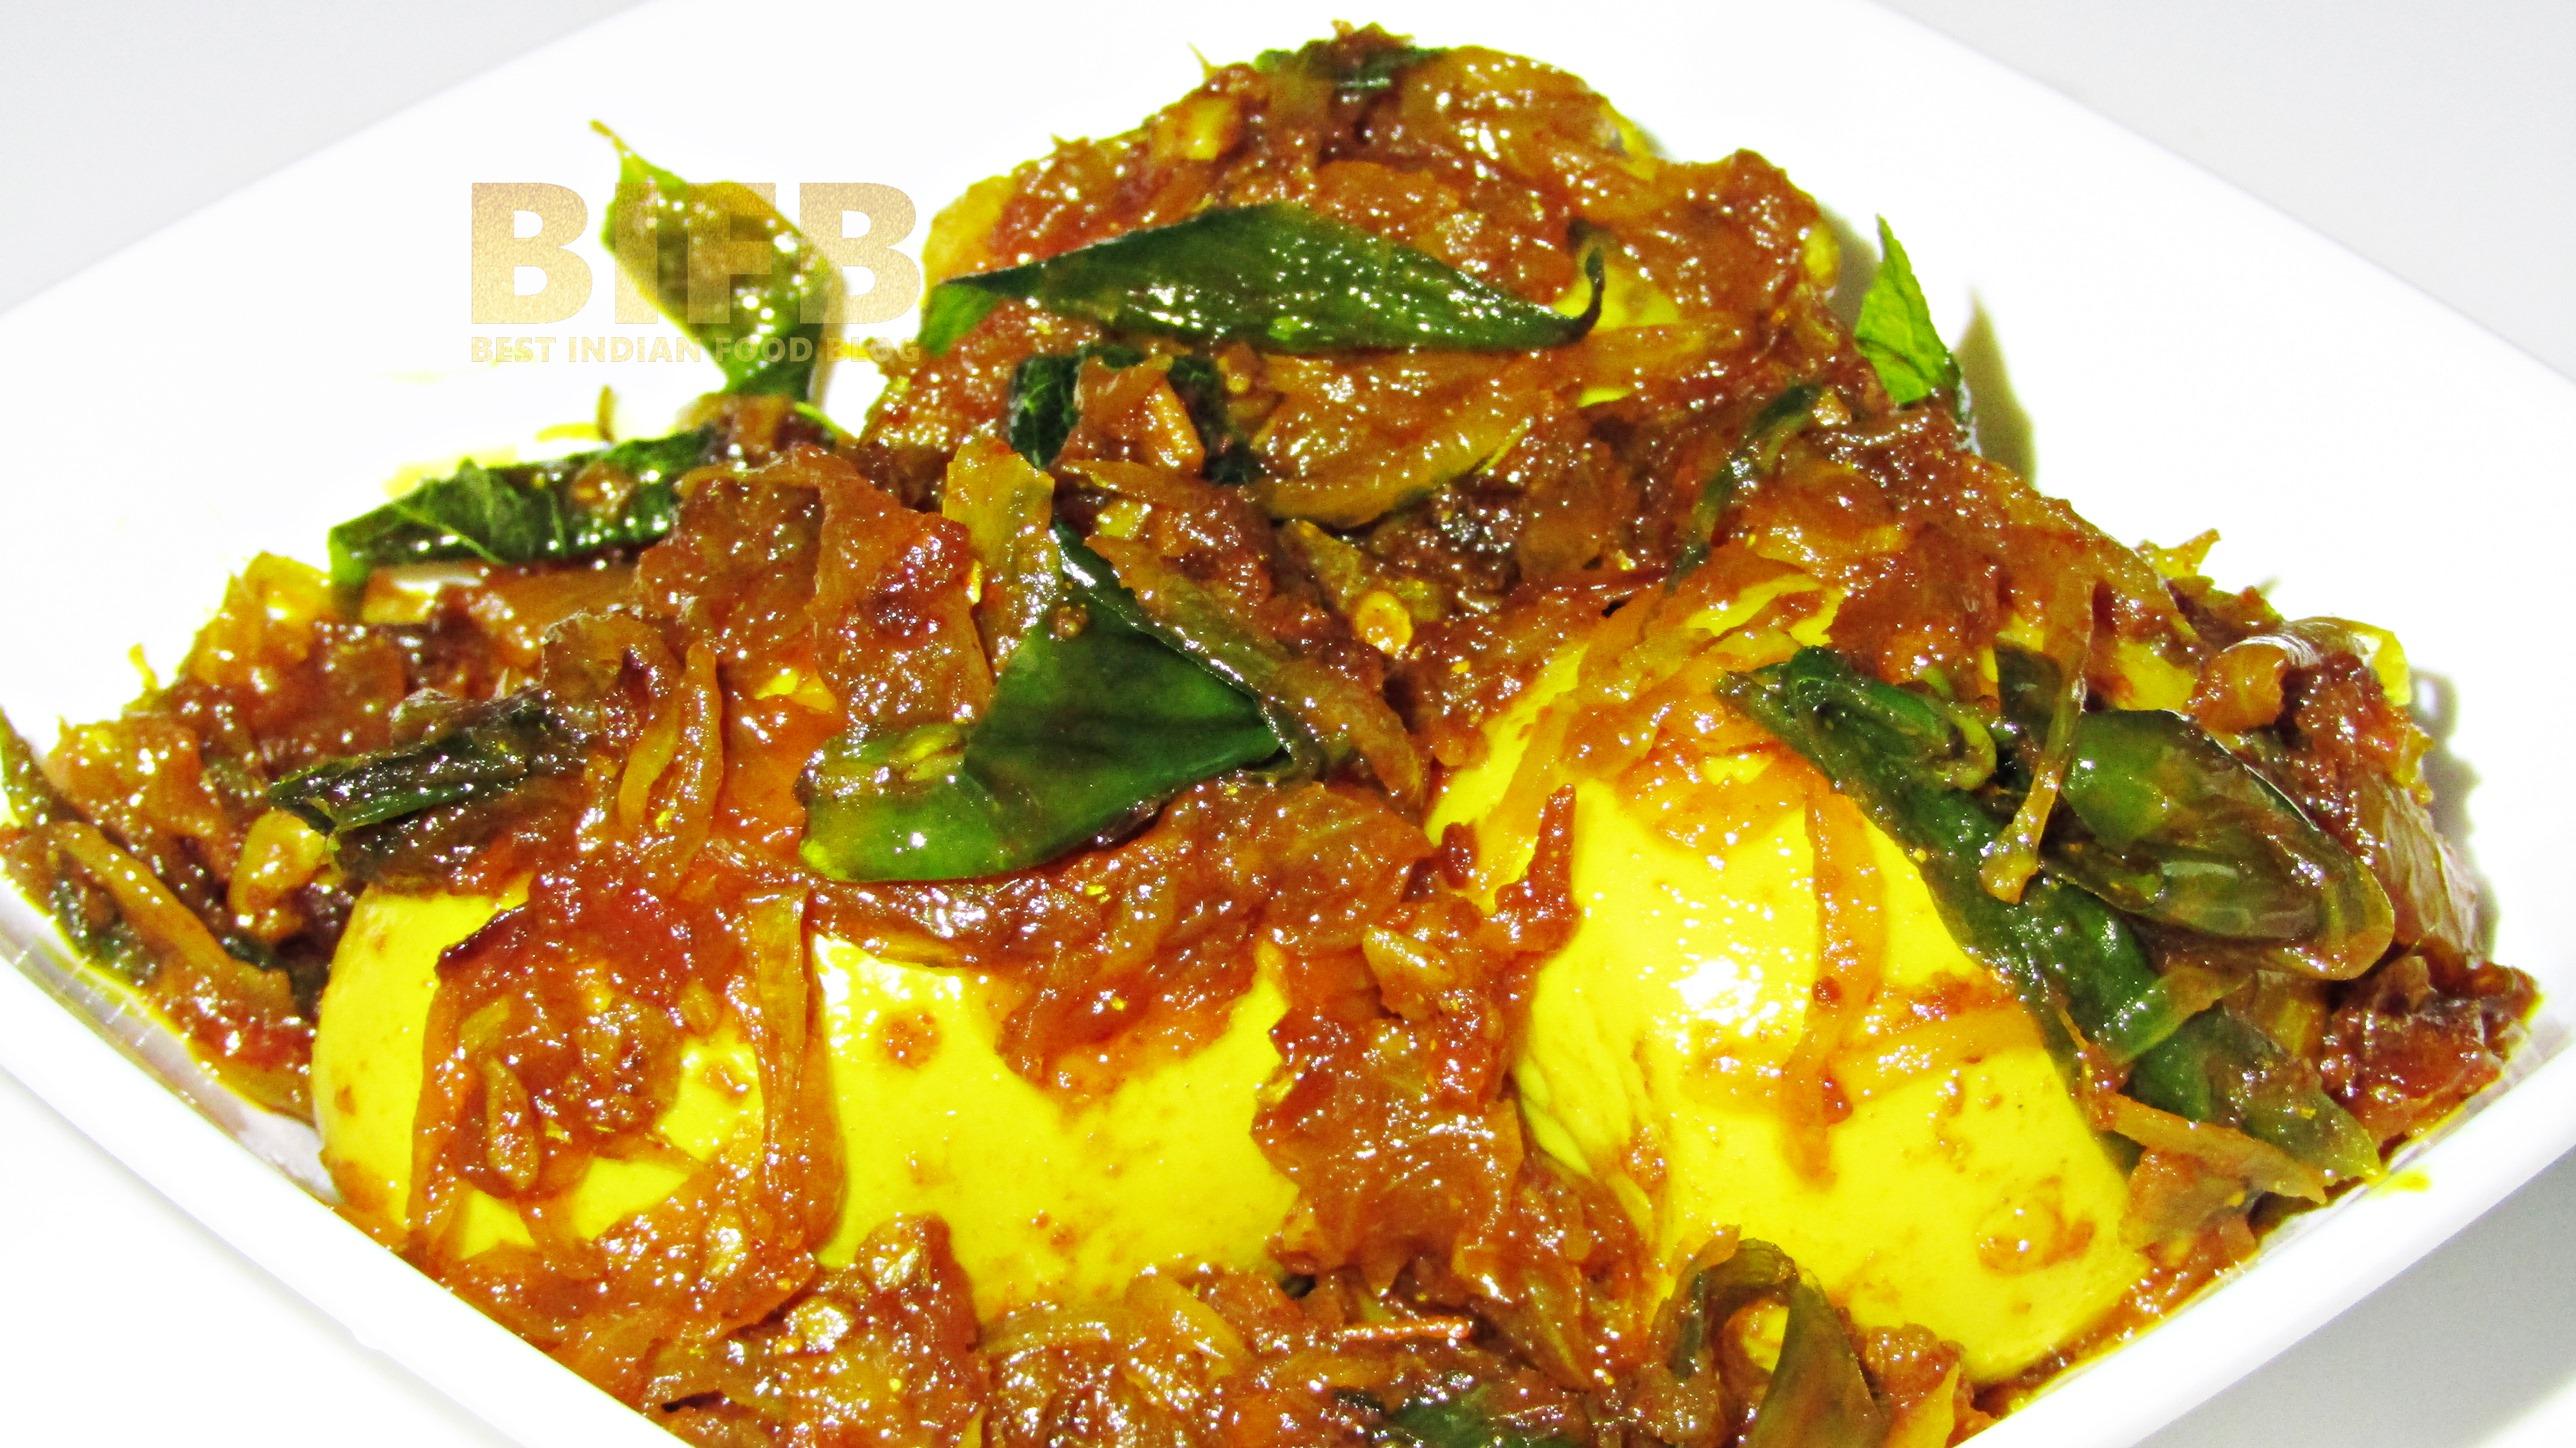 Tharavu Mutta Piralan from Kerala, India | Best Indian Food Blog | Duck Egg recipe